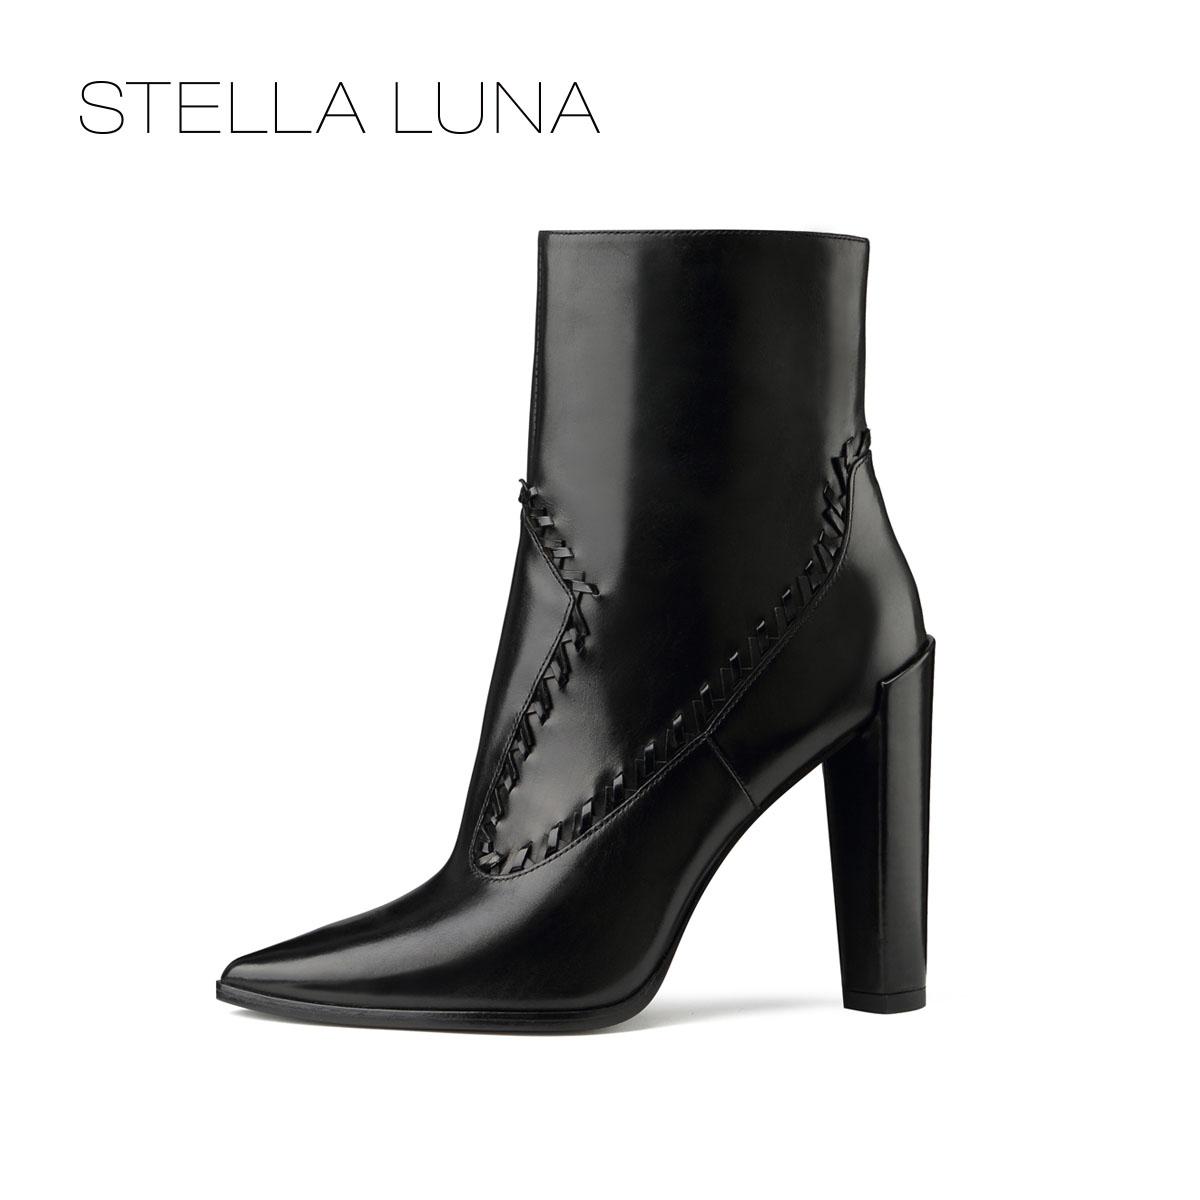 STELLA LUNA女靴冬季新款时尚尖头细跟简约短靴女SF320L11674